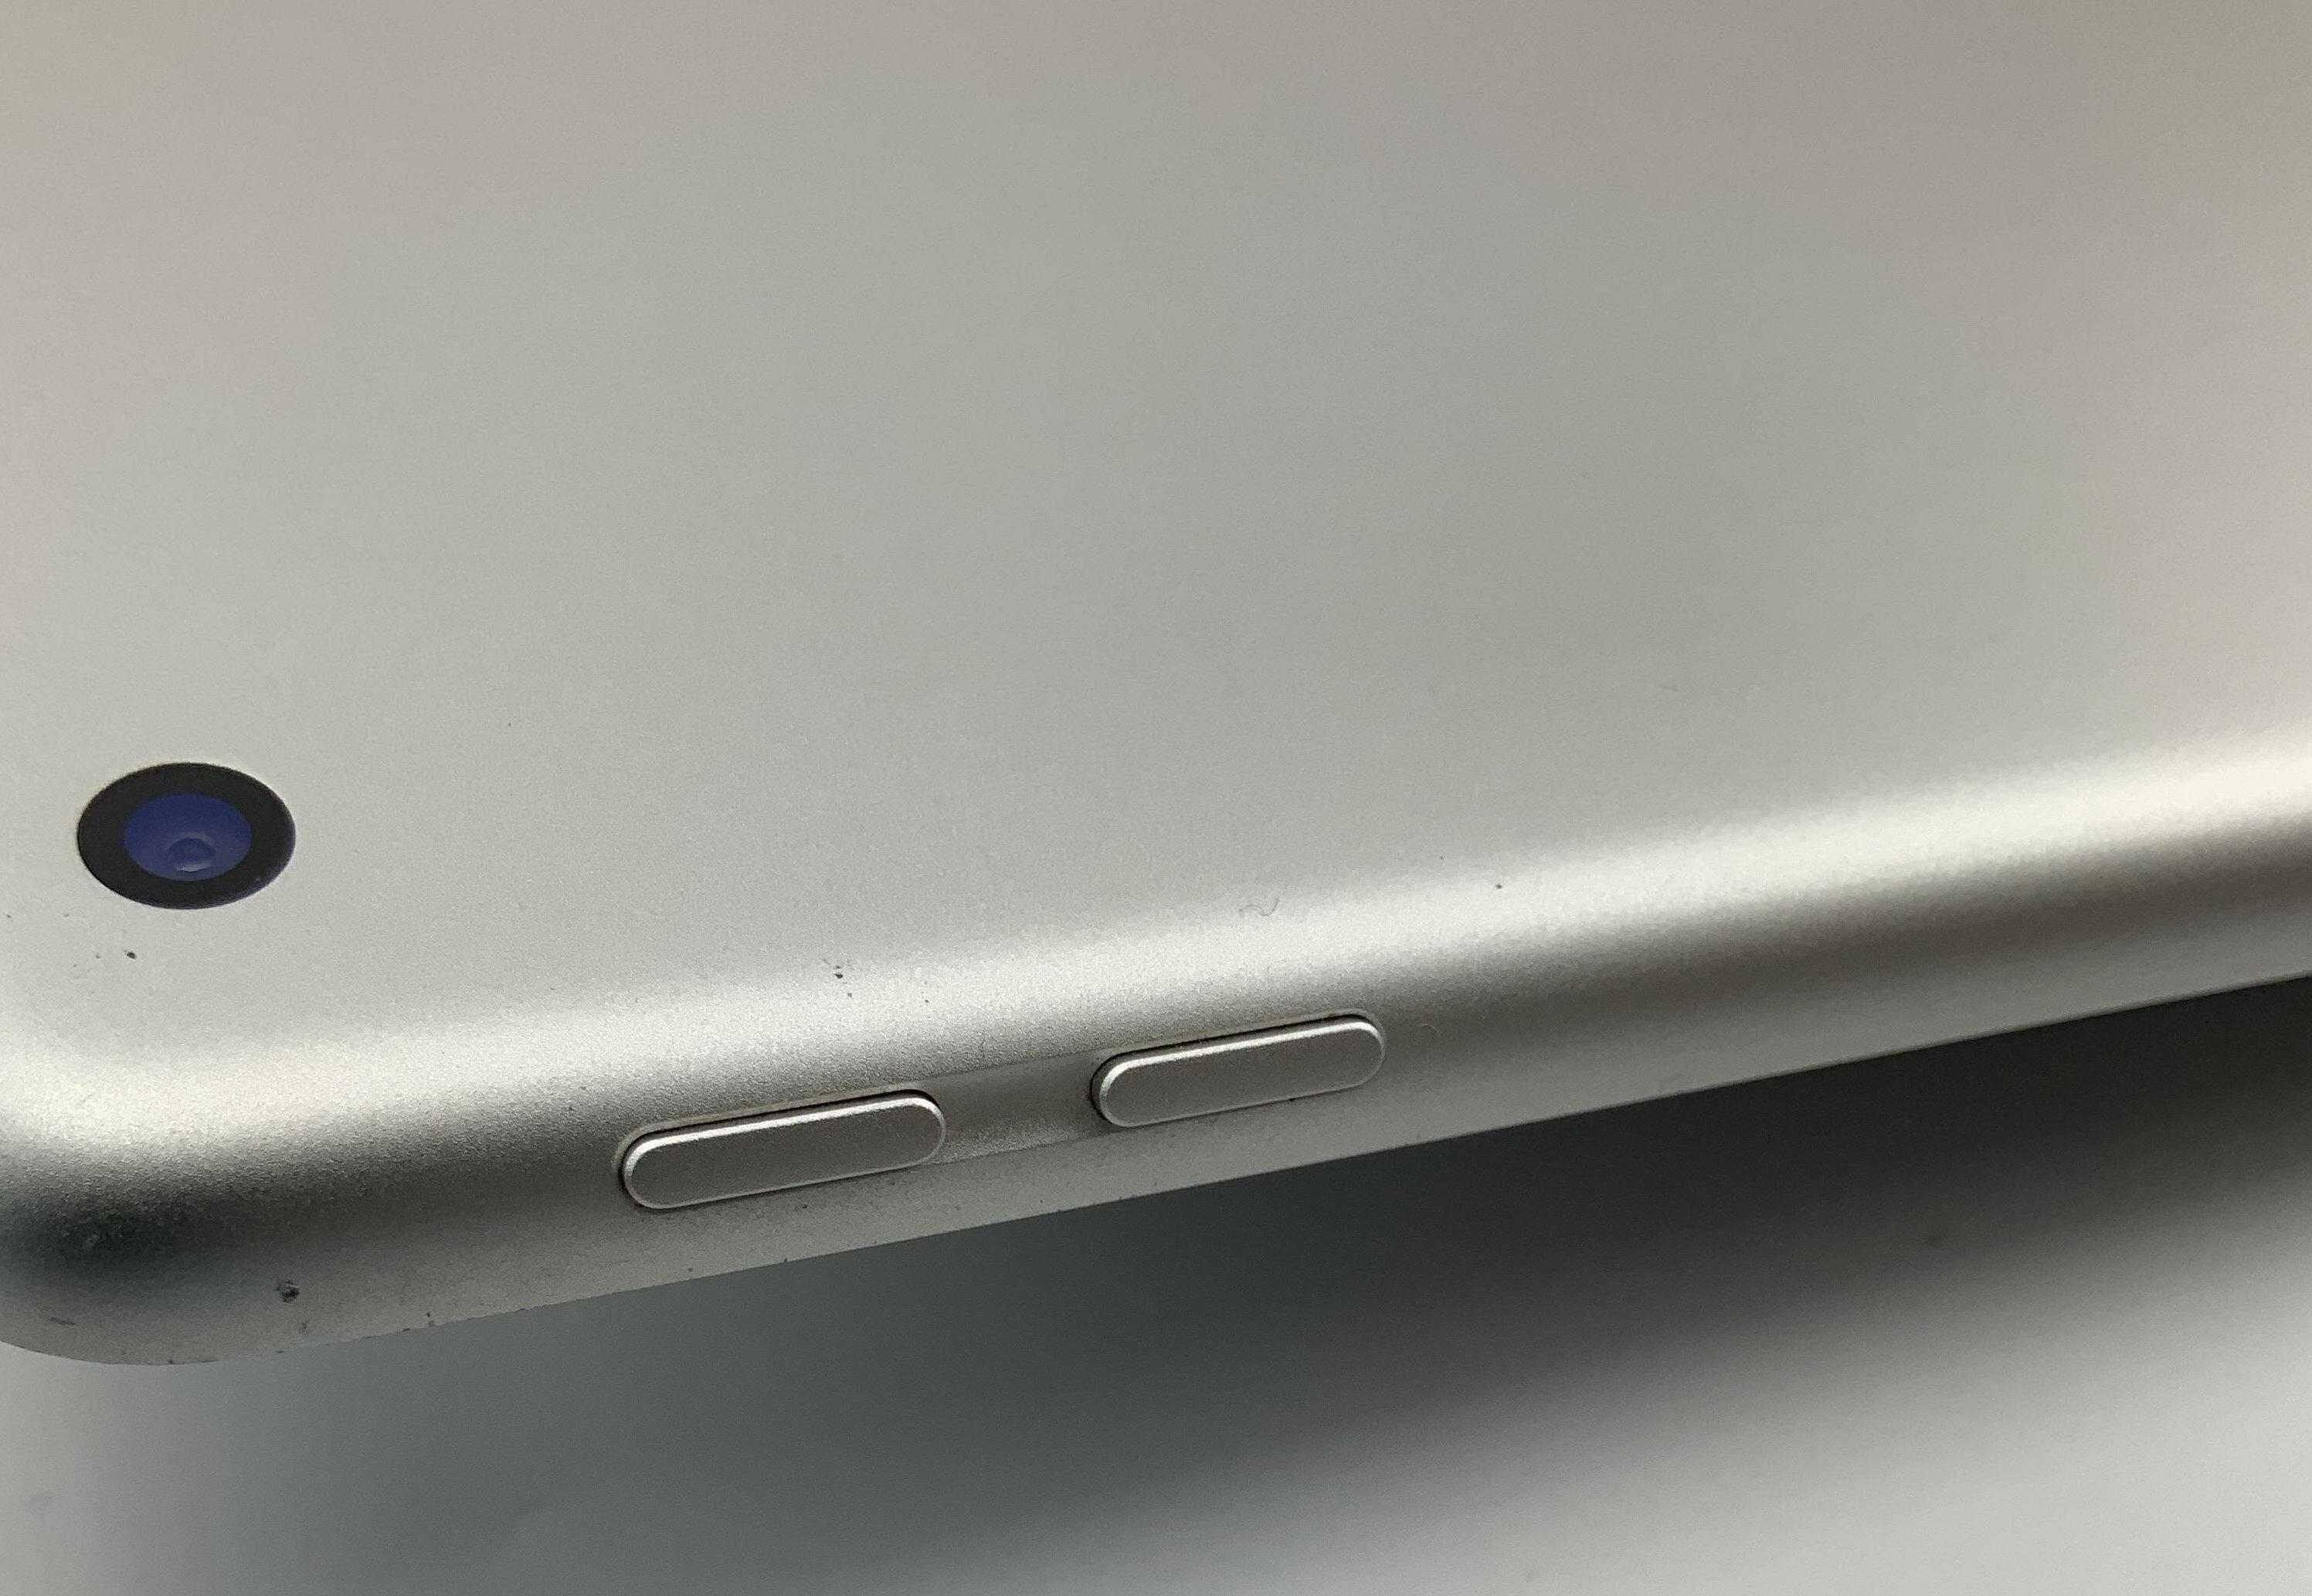 iPad 5 Wi-Fi 128GB, 128GB, Silver, immagine 4